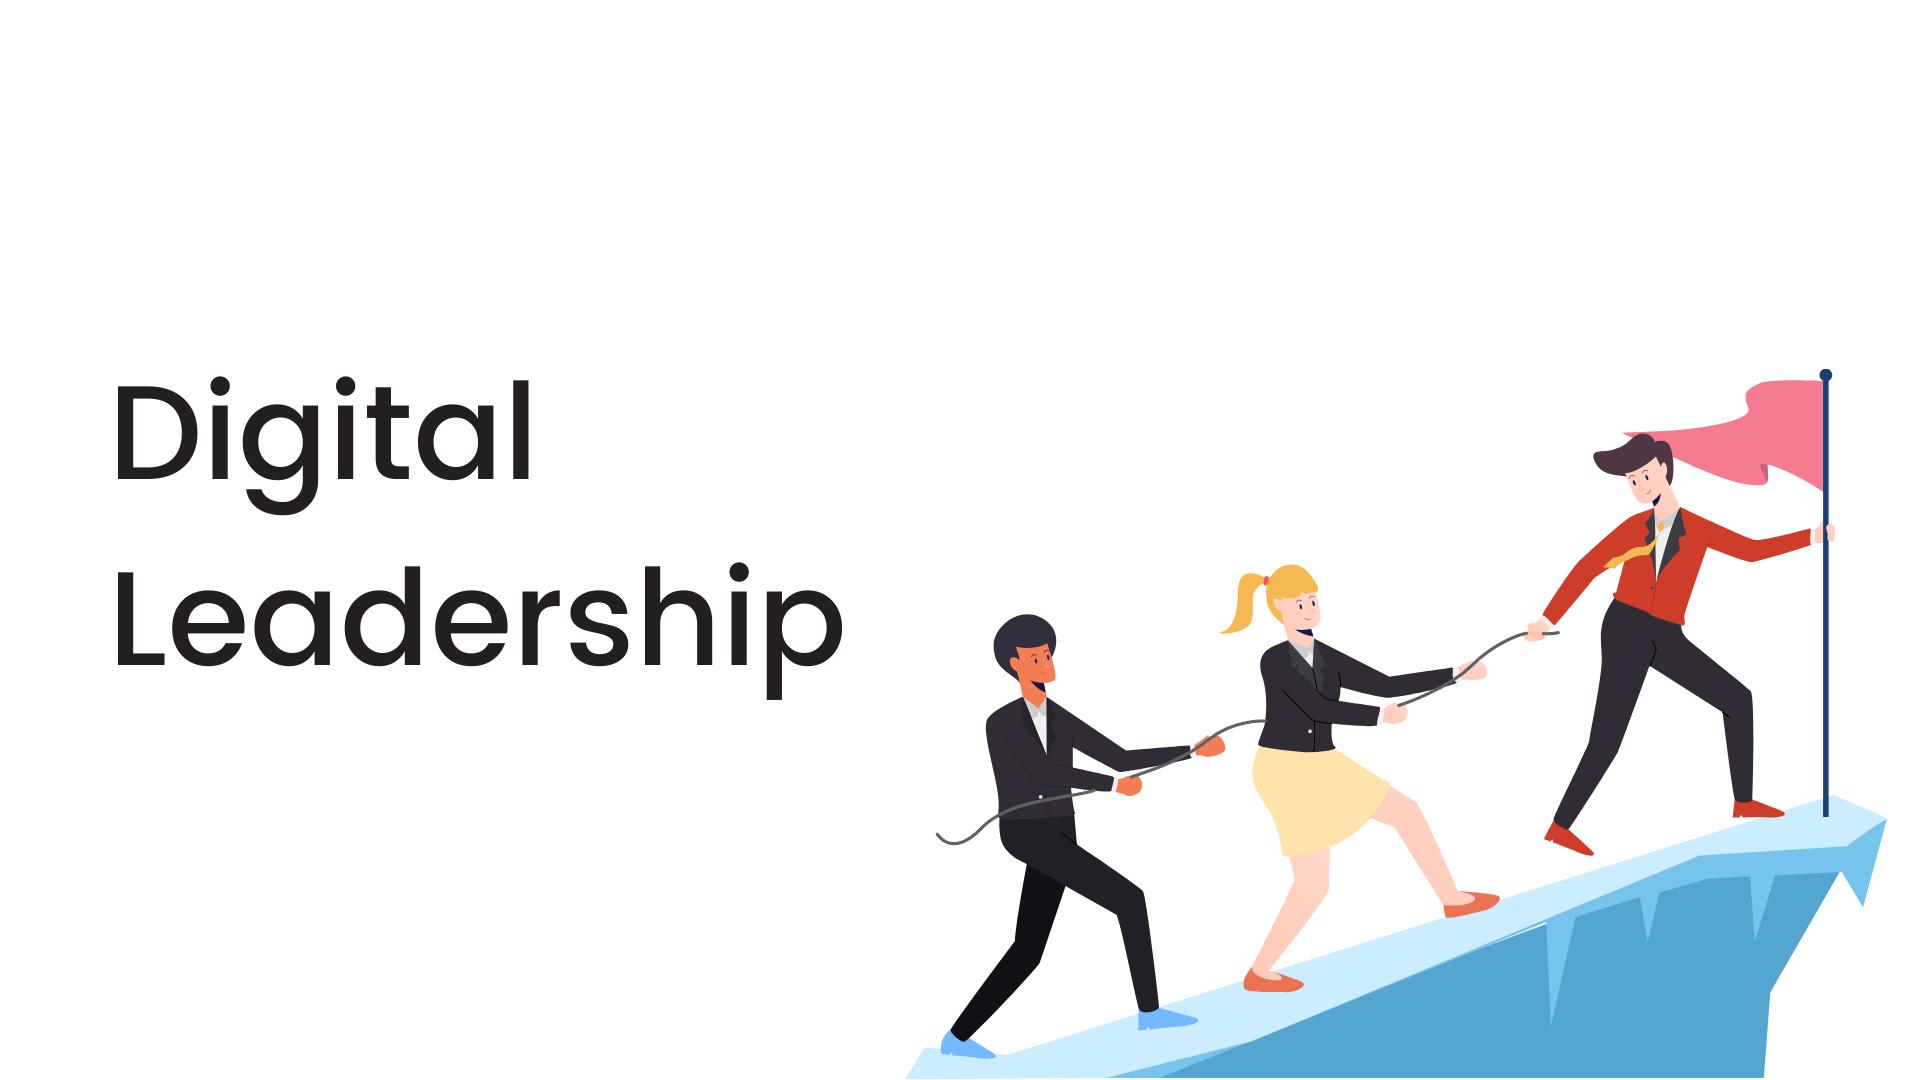 Digital_Coach_Academy_Personal_Branding_Architect_Digital_Leadership